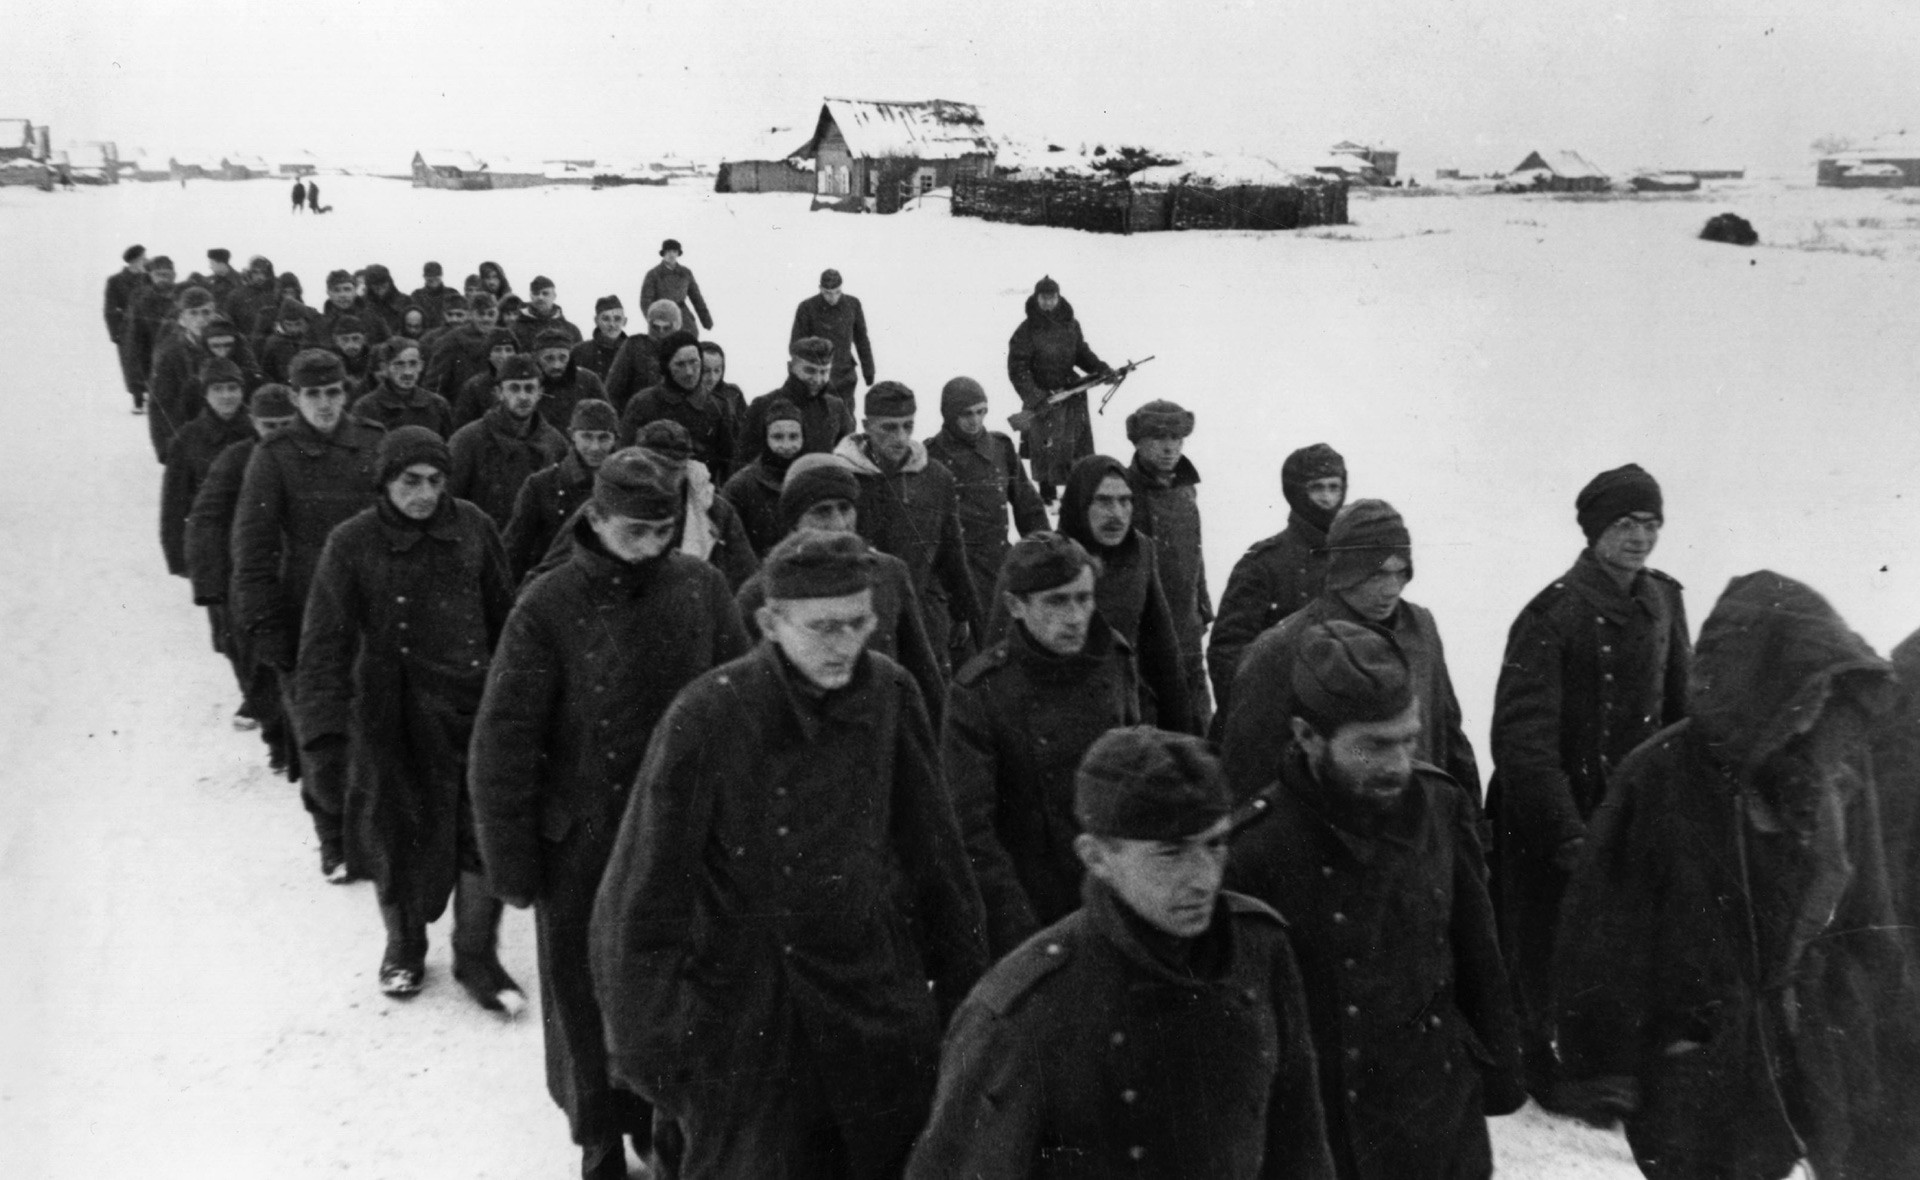 Penangakapan tentara Jerman tak lepas dari upaya Sudoplatov selama perang.